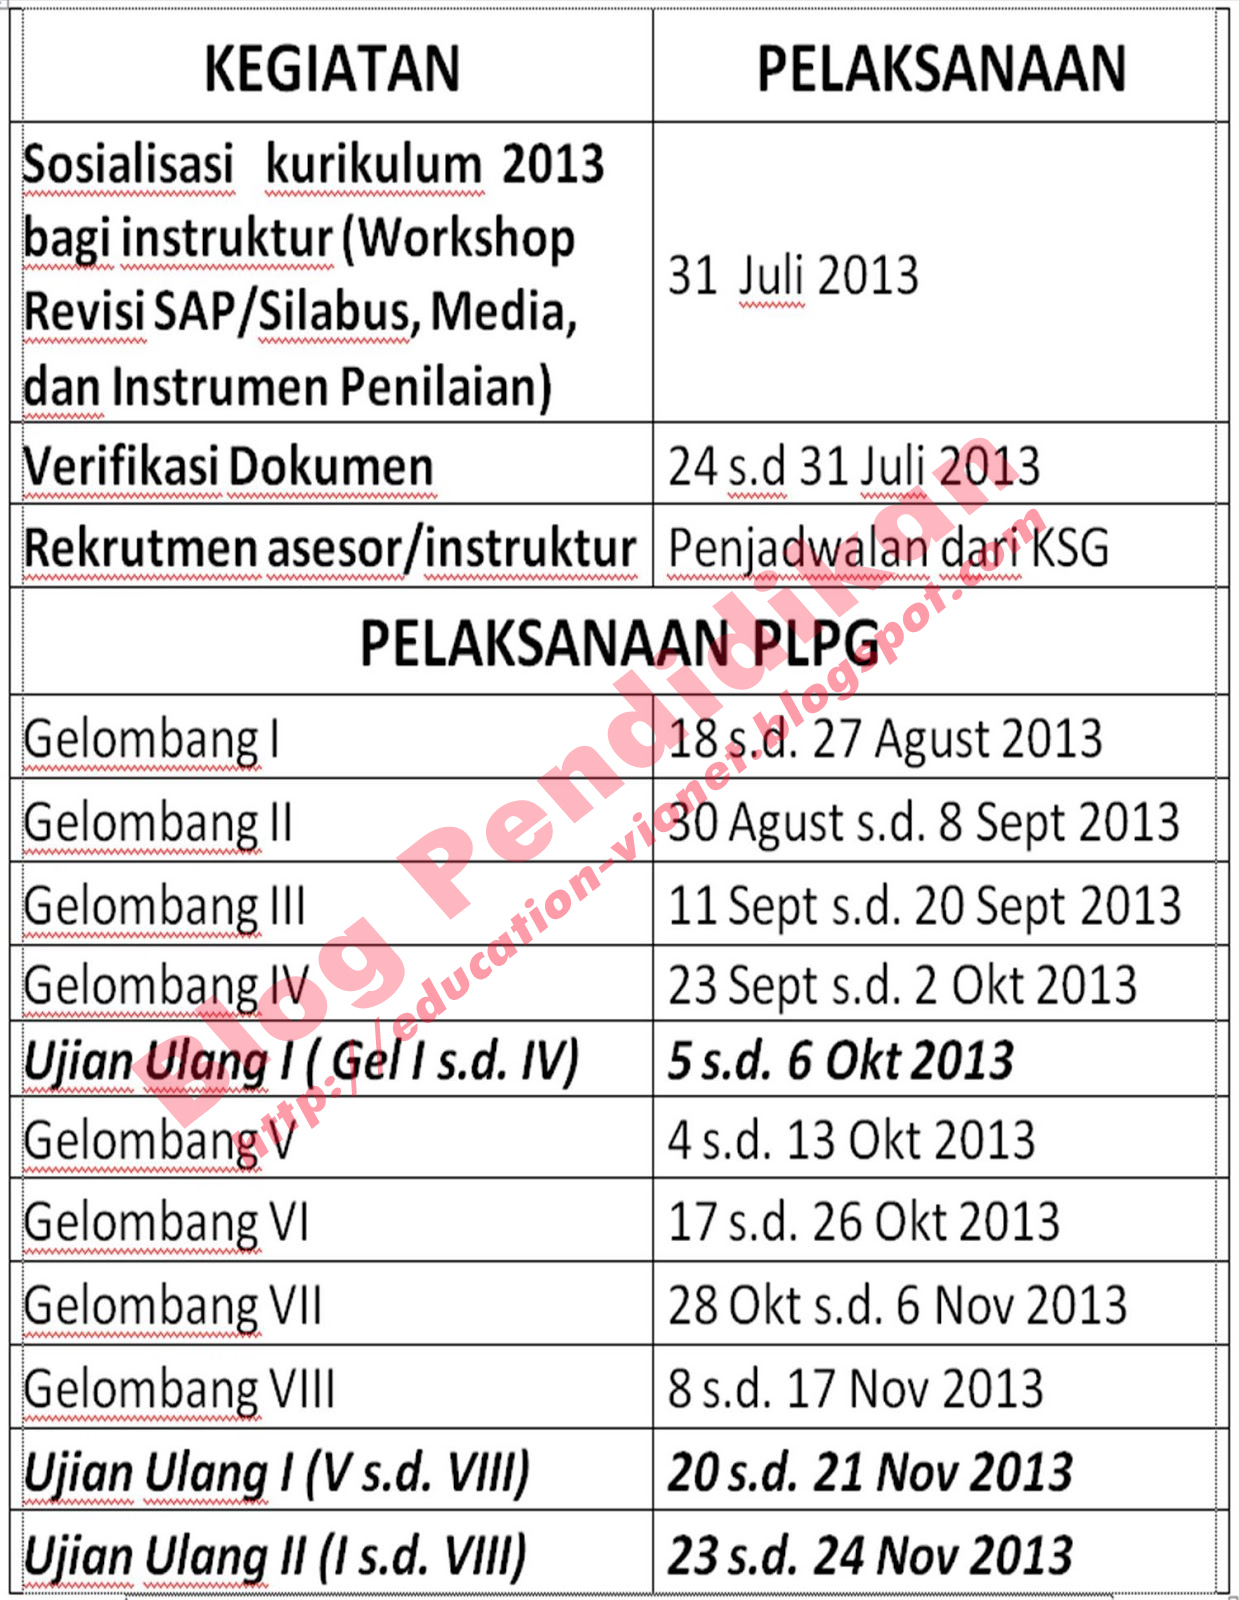 Jadwal PLPG Sertifikasi Guru 2013 Rayon 120 Provinsi Kalimantan Barat